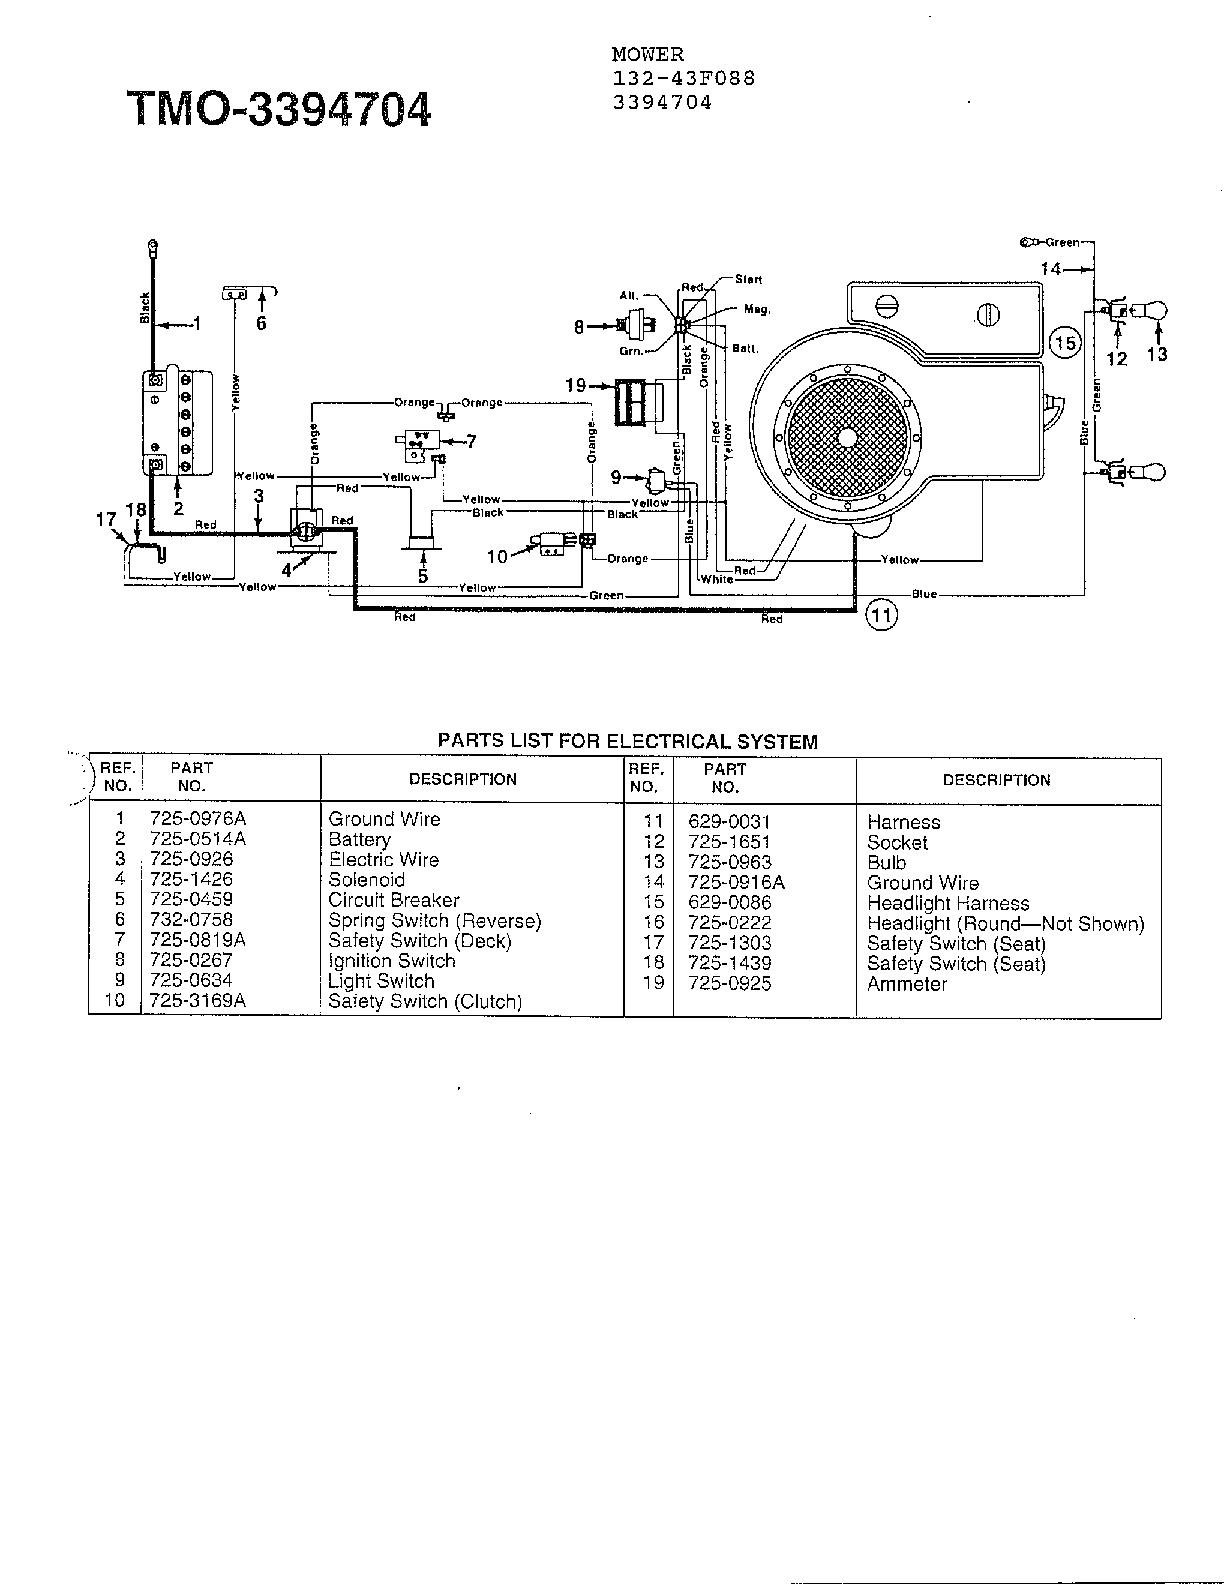 Mtd Model 132-431F088 Lawn, Tractor Genuine Parts - Mtd Riding Lawn Mower Wiring Diagram